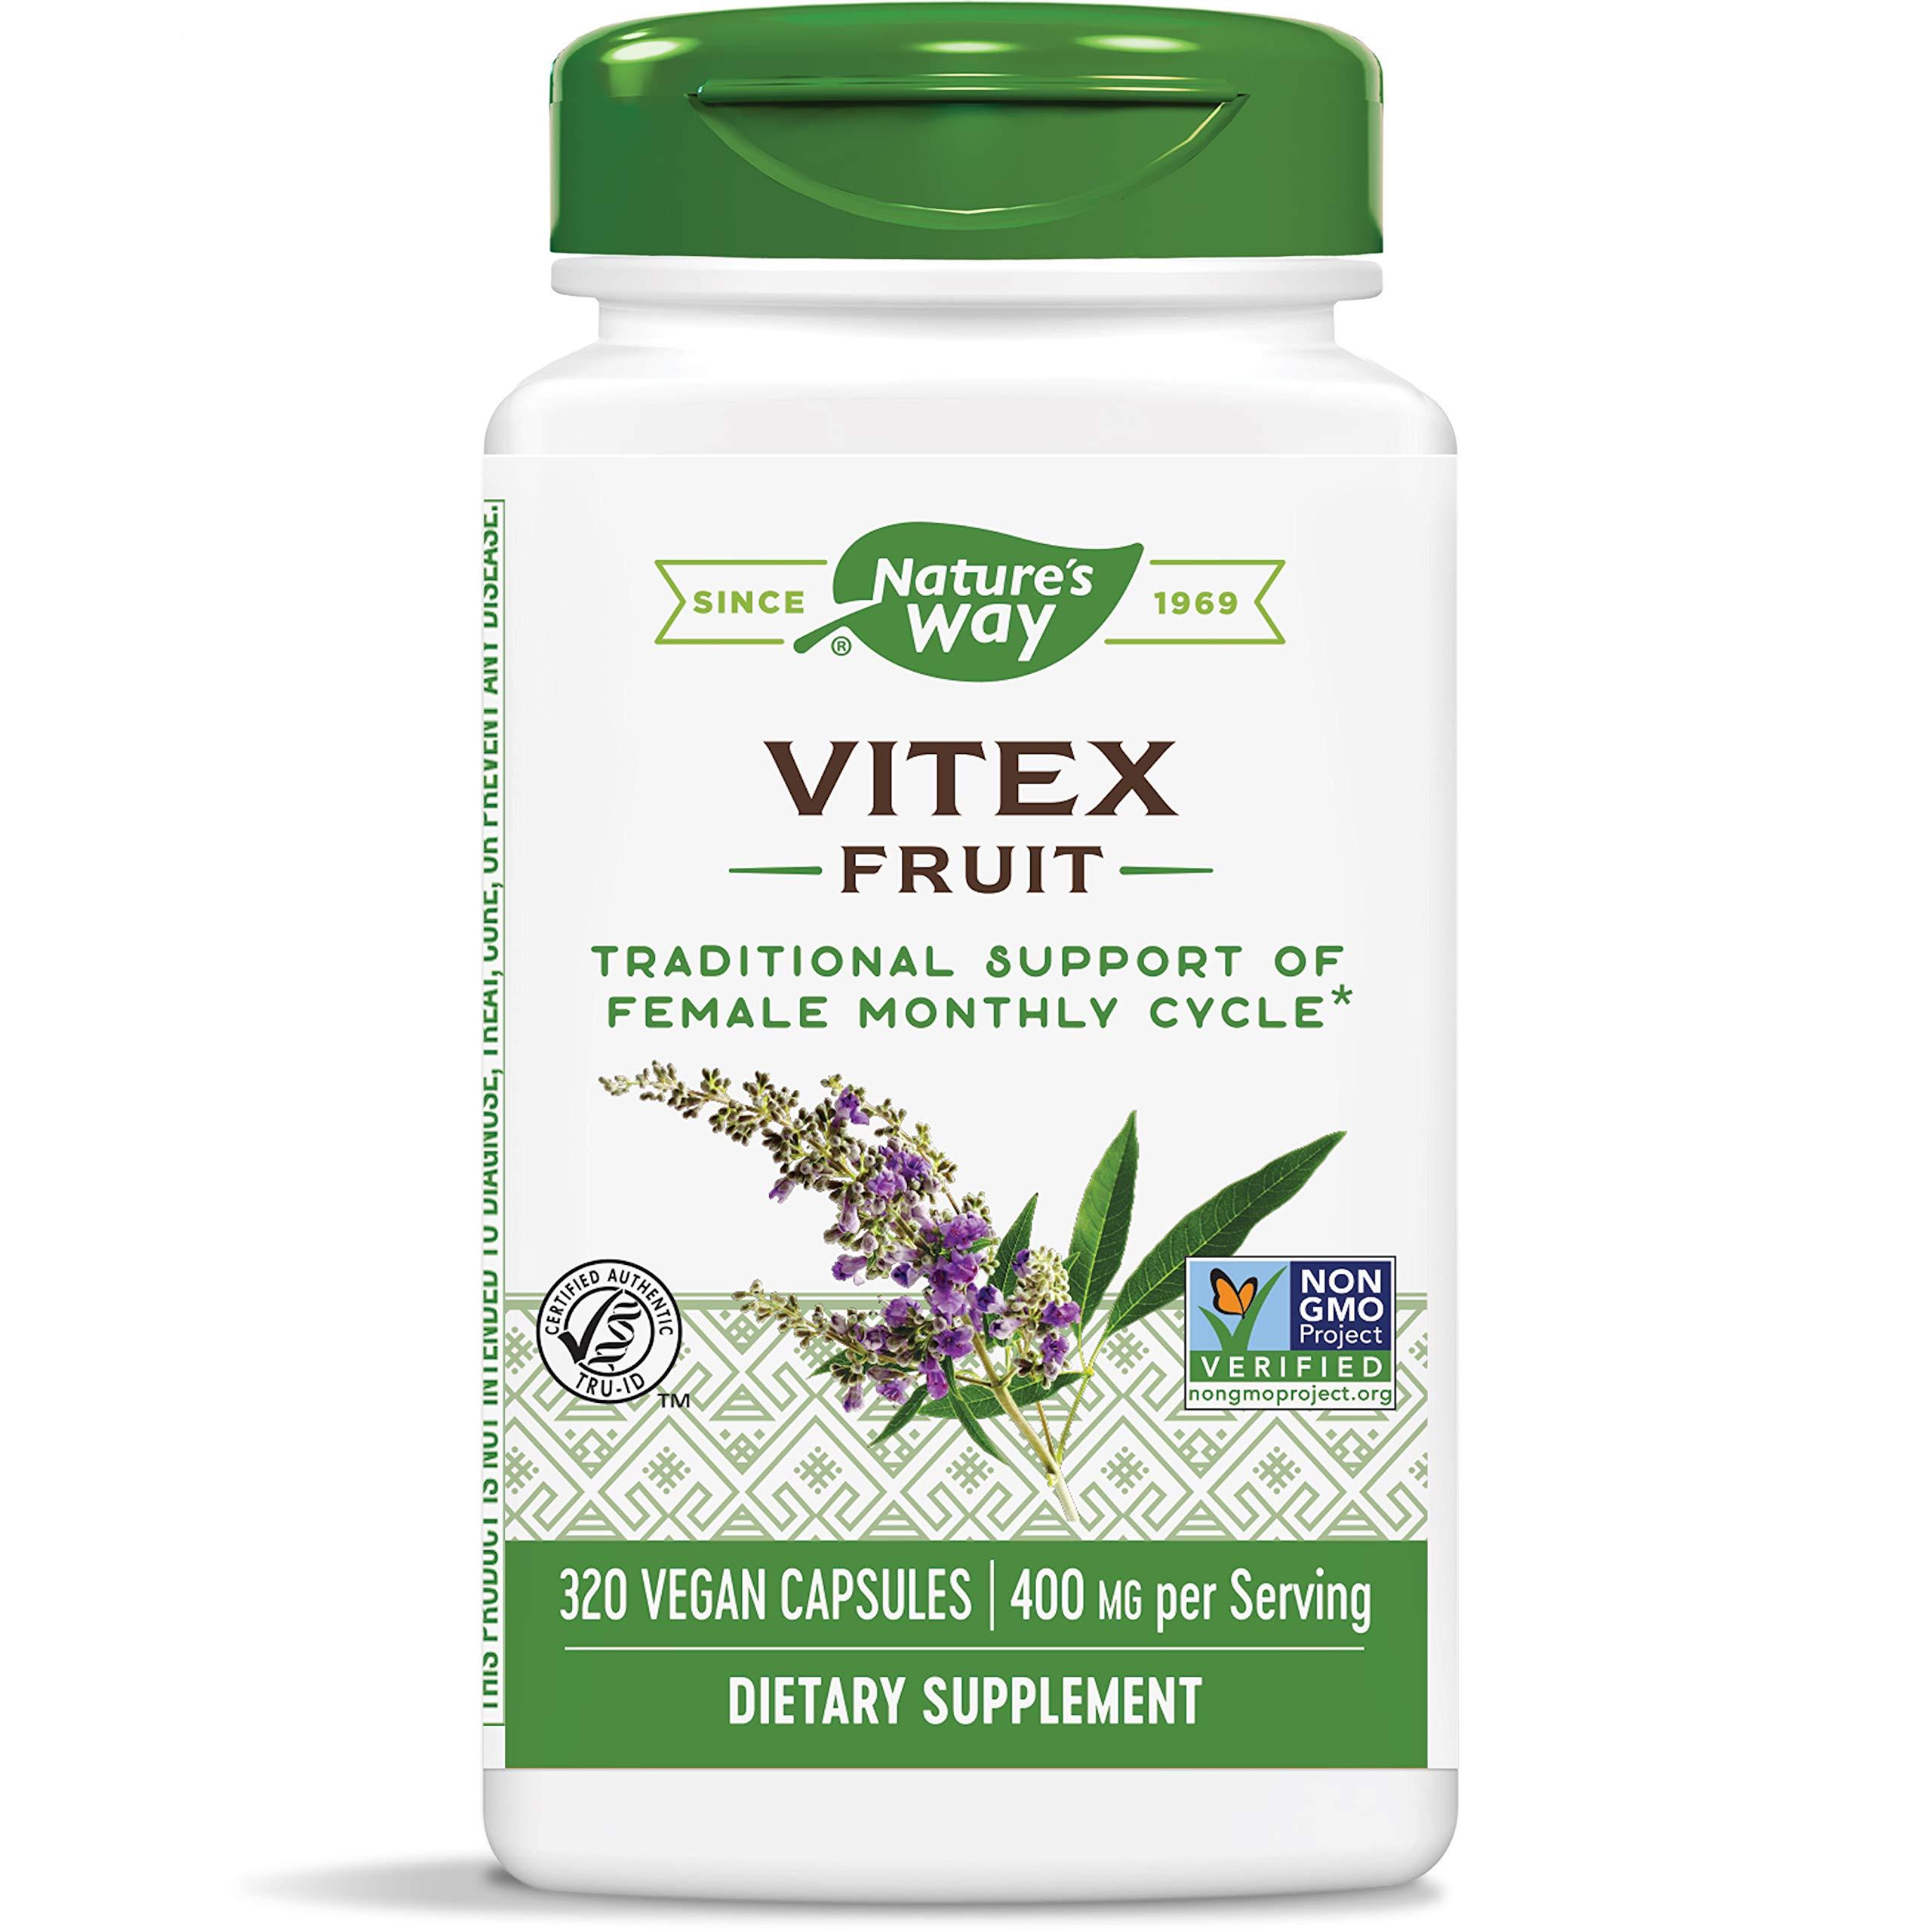 Nature's Way - Vitex Fruit 400 mg. - 320 Vegetarian Capsules